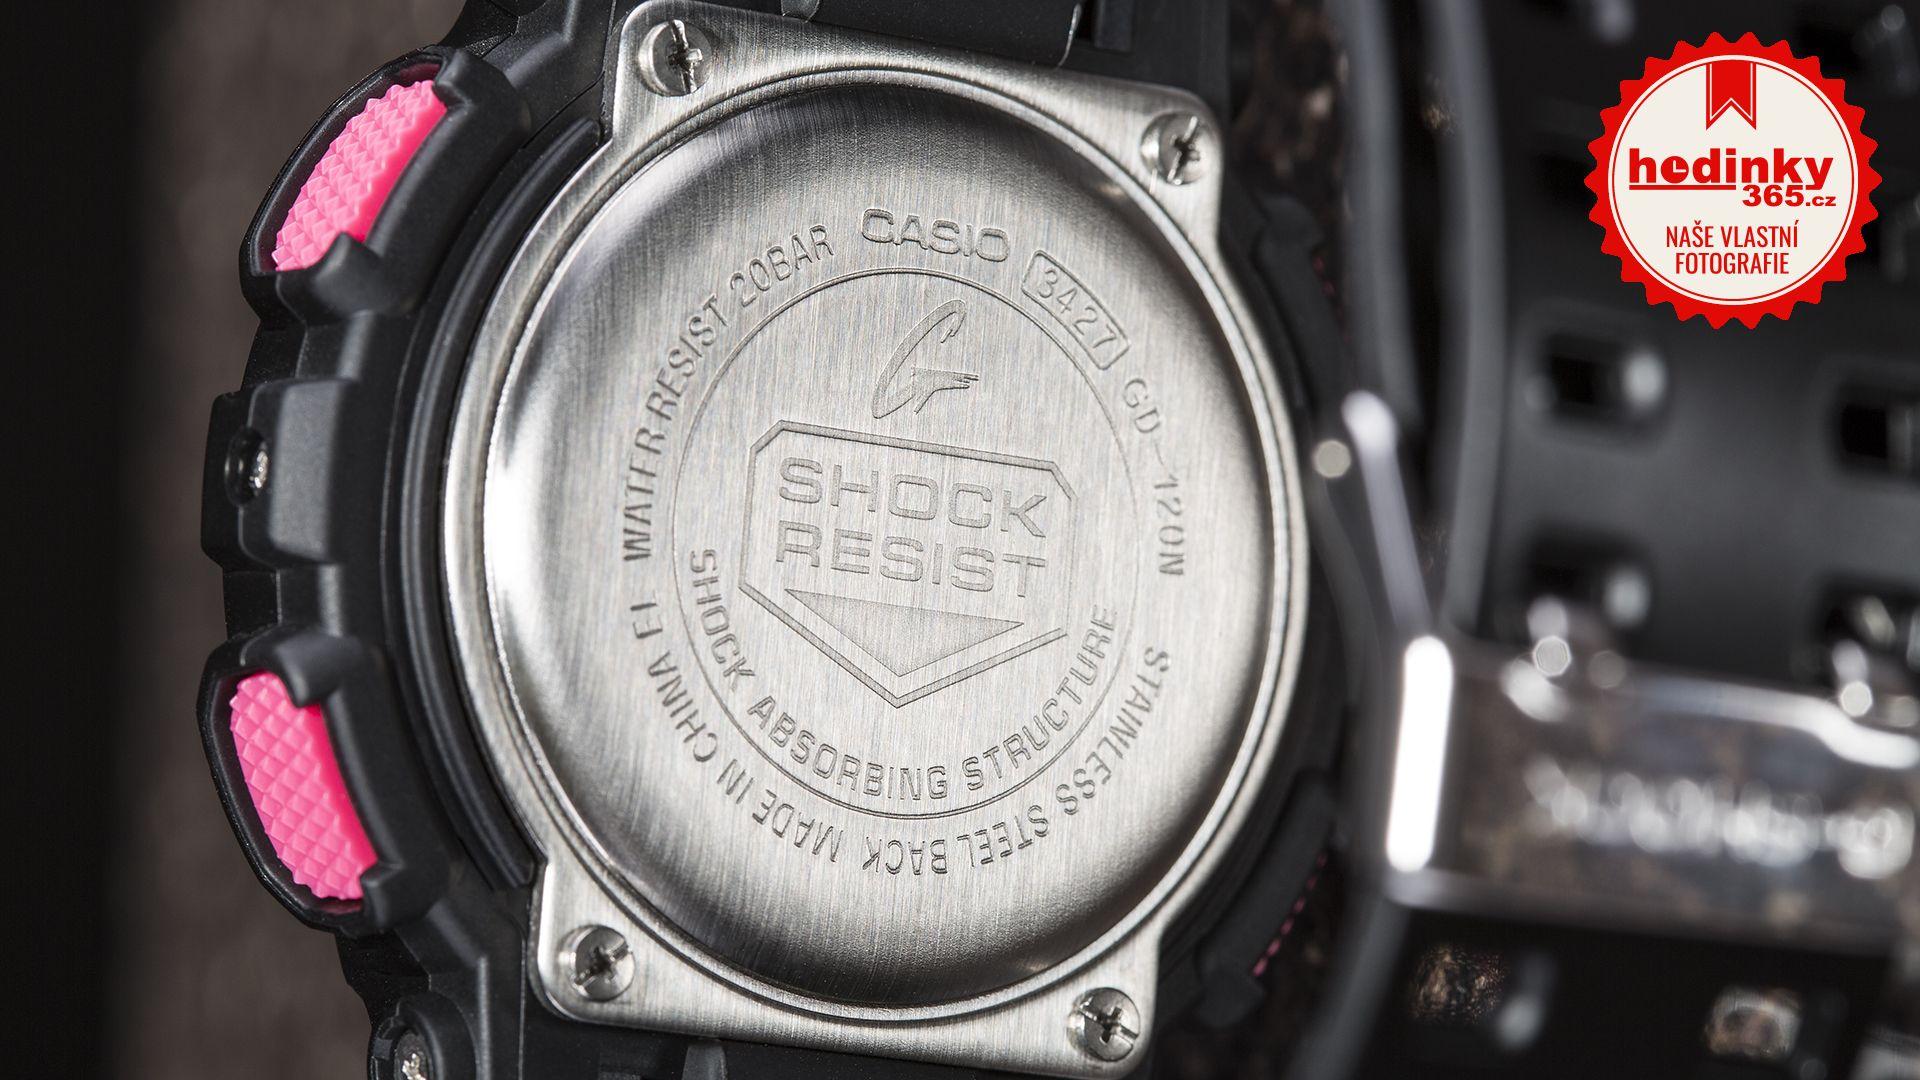 Casio G-Shock Original GD-120N-1B4ER  bea13c9c4e